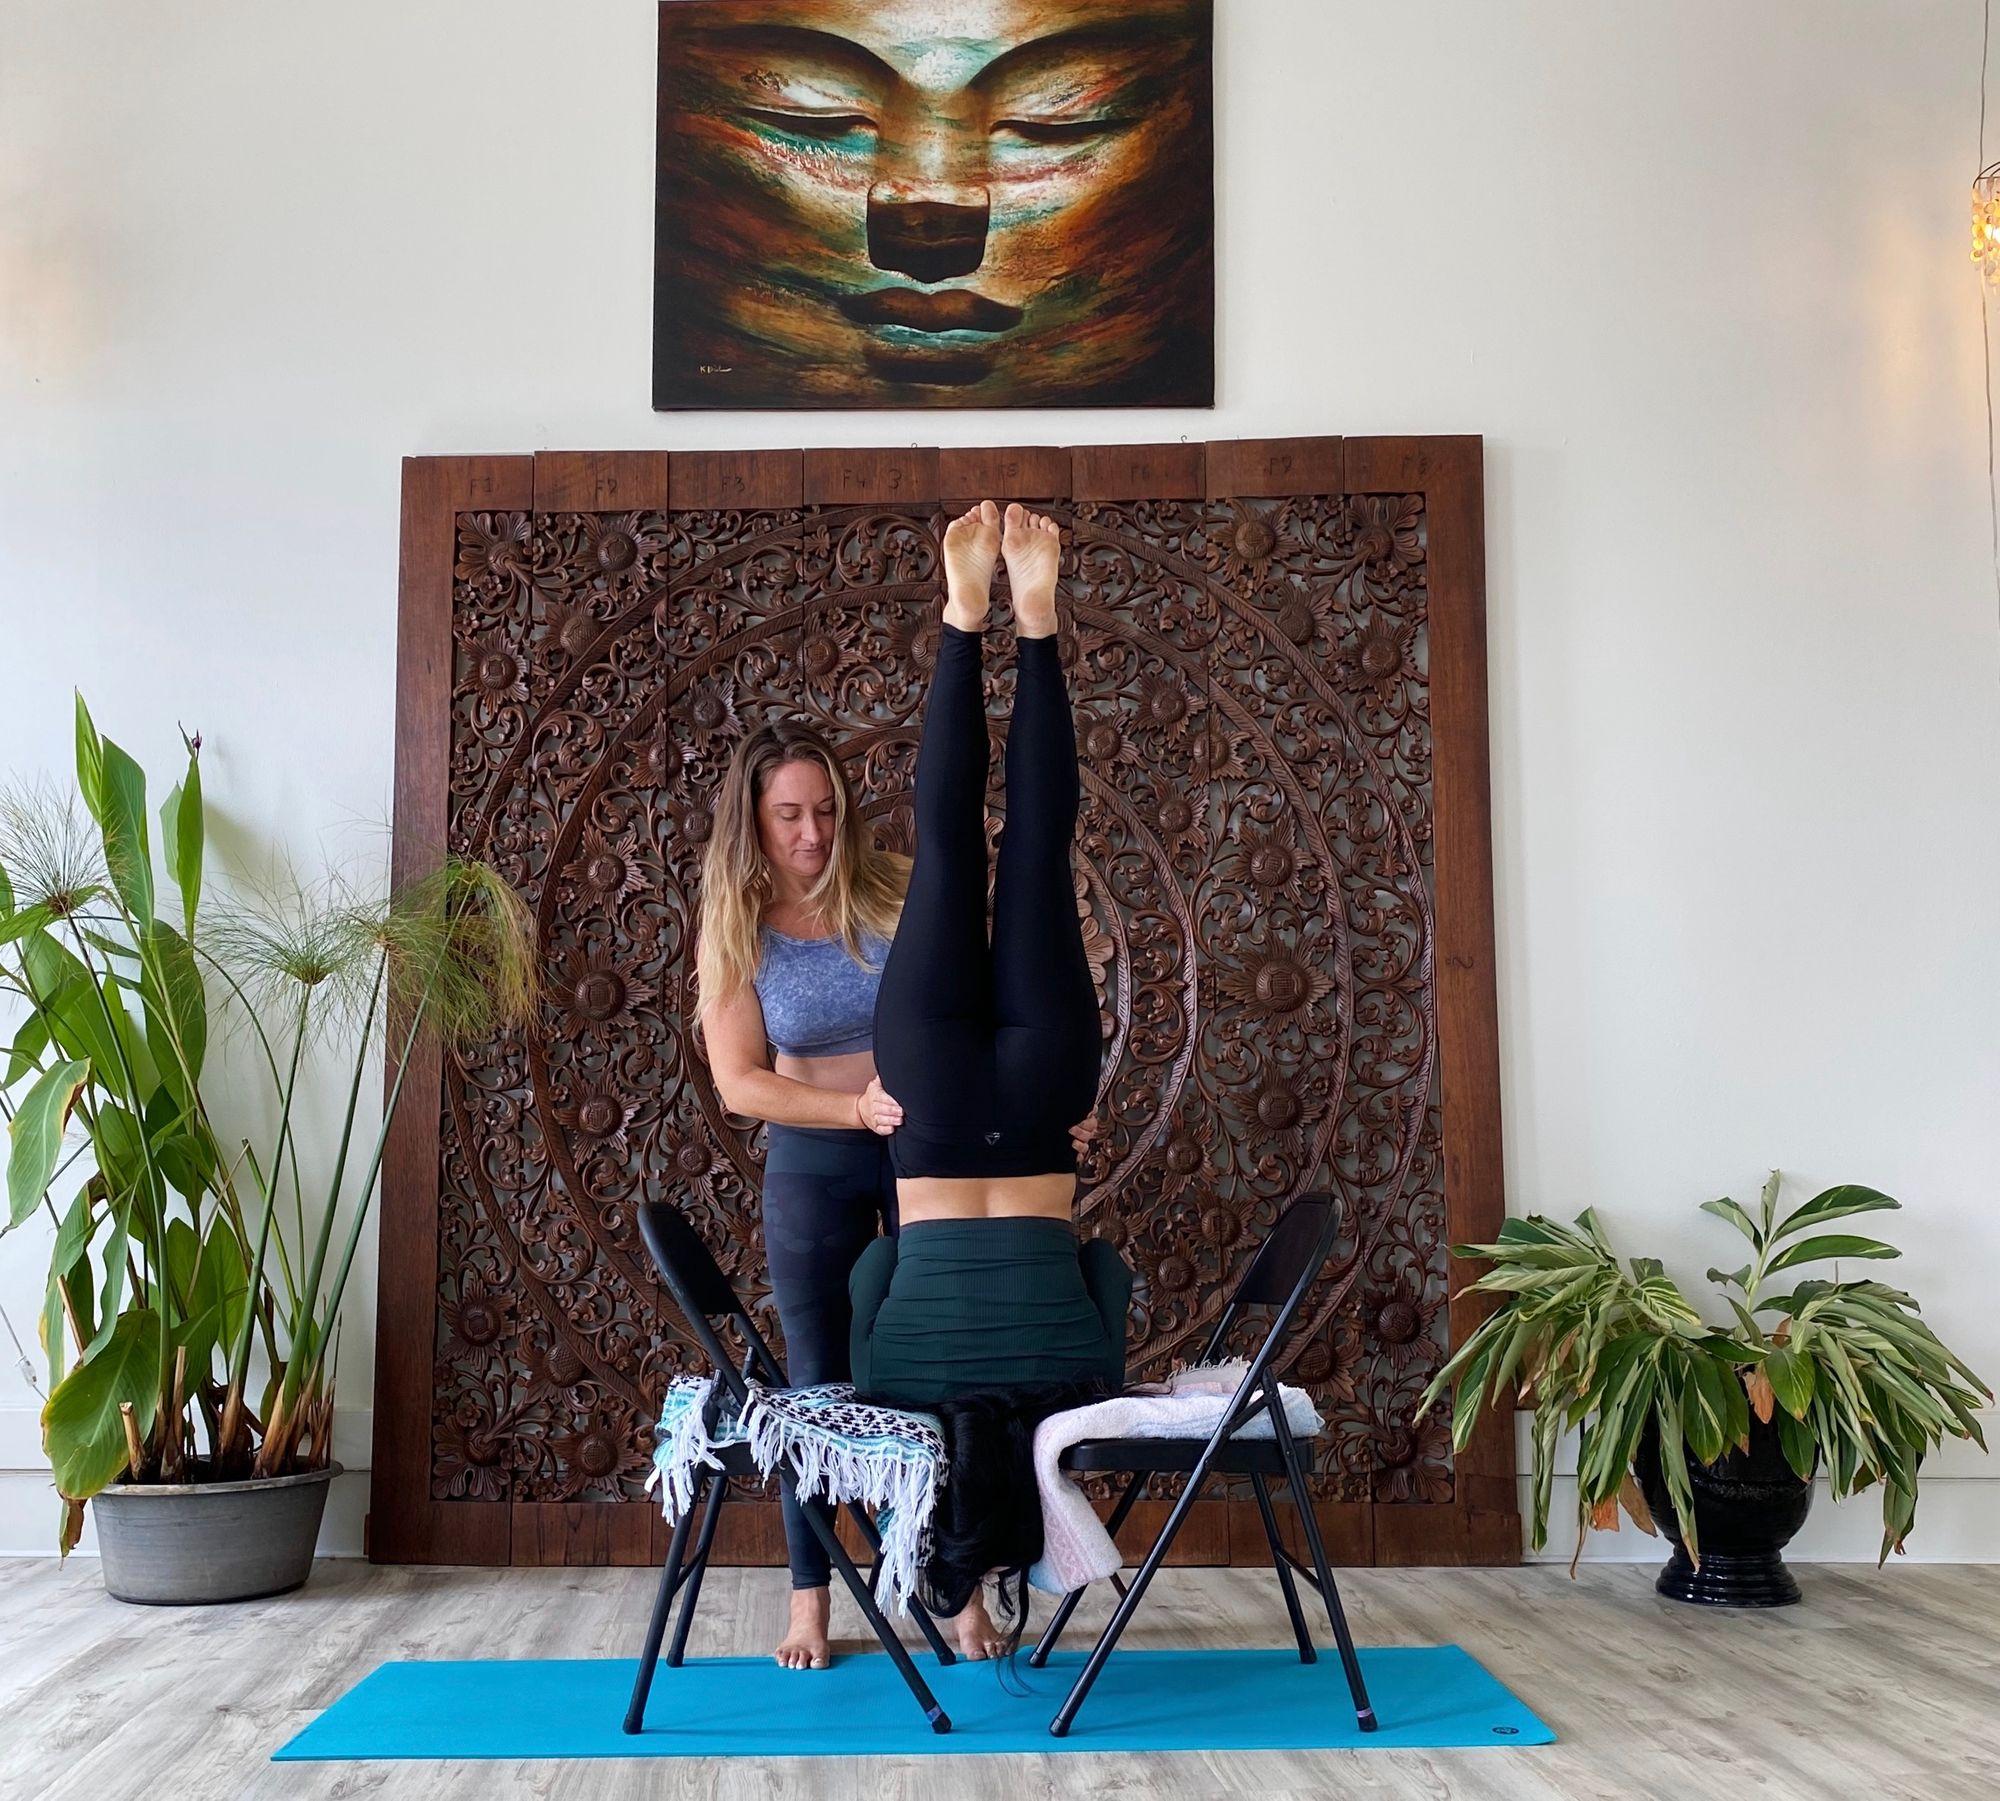 Private-Yoga-Molly-Masaoka.jpg